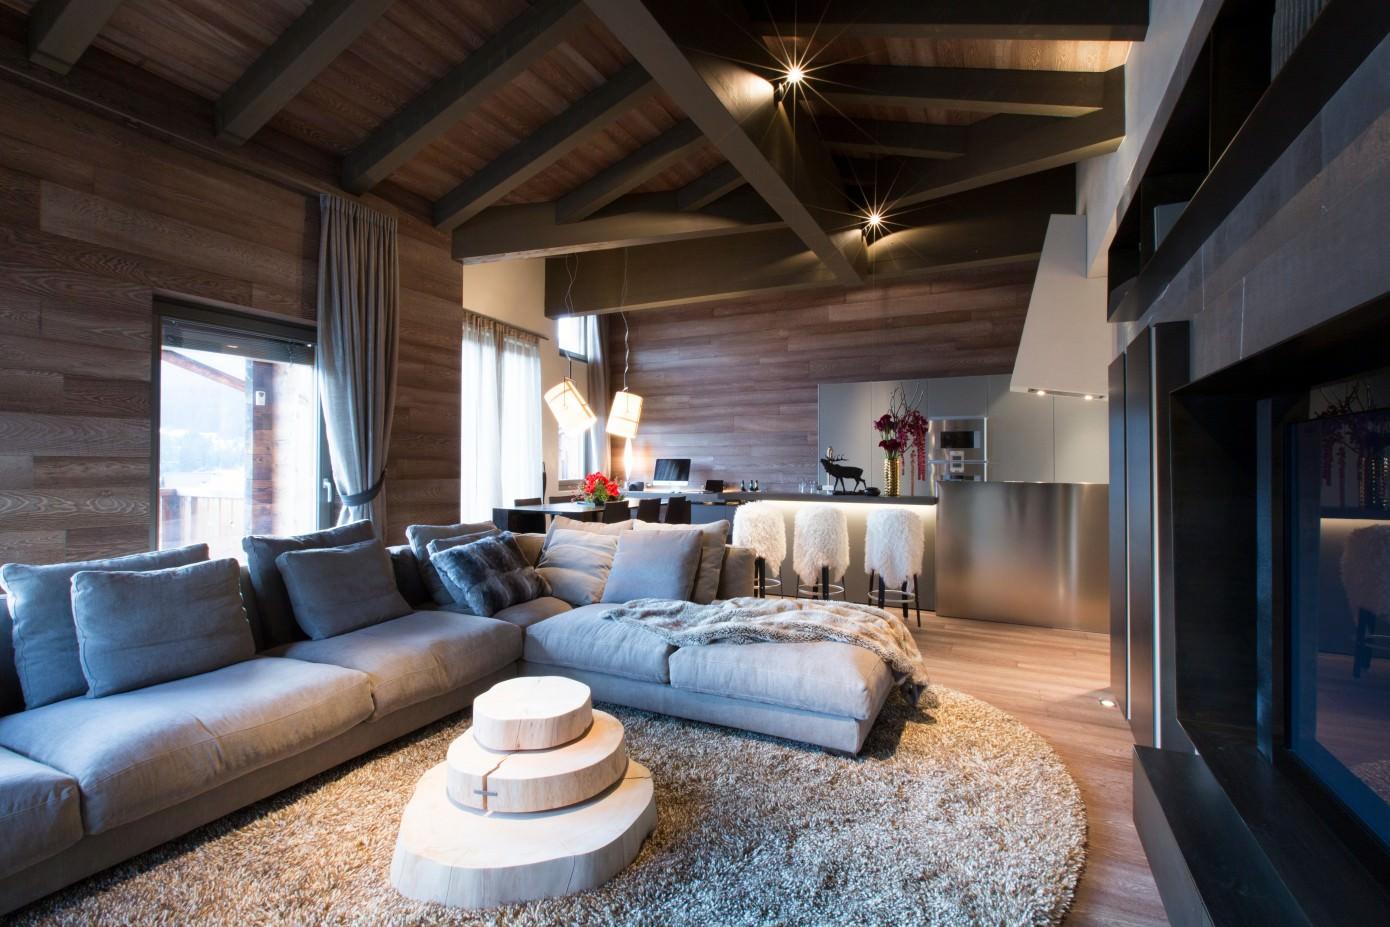 Lenzerheide Apartment By Angelo Pozzoli HomeAdore